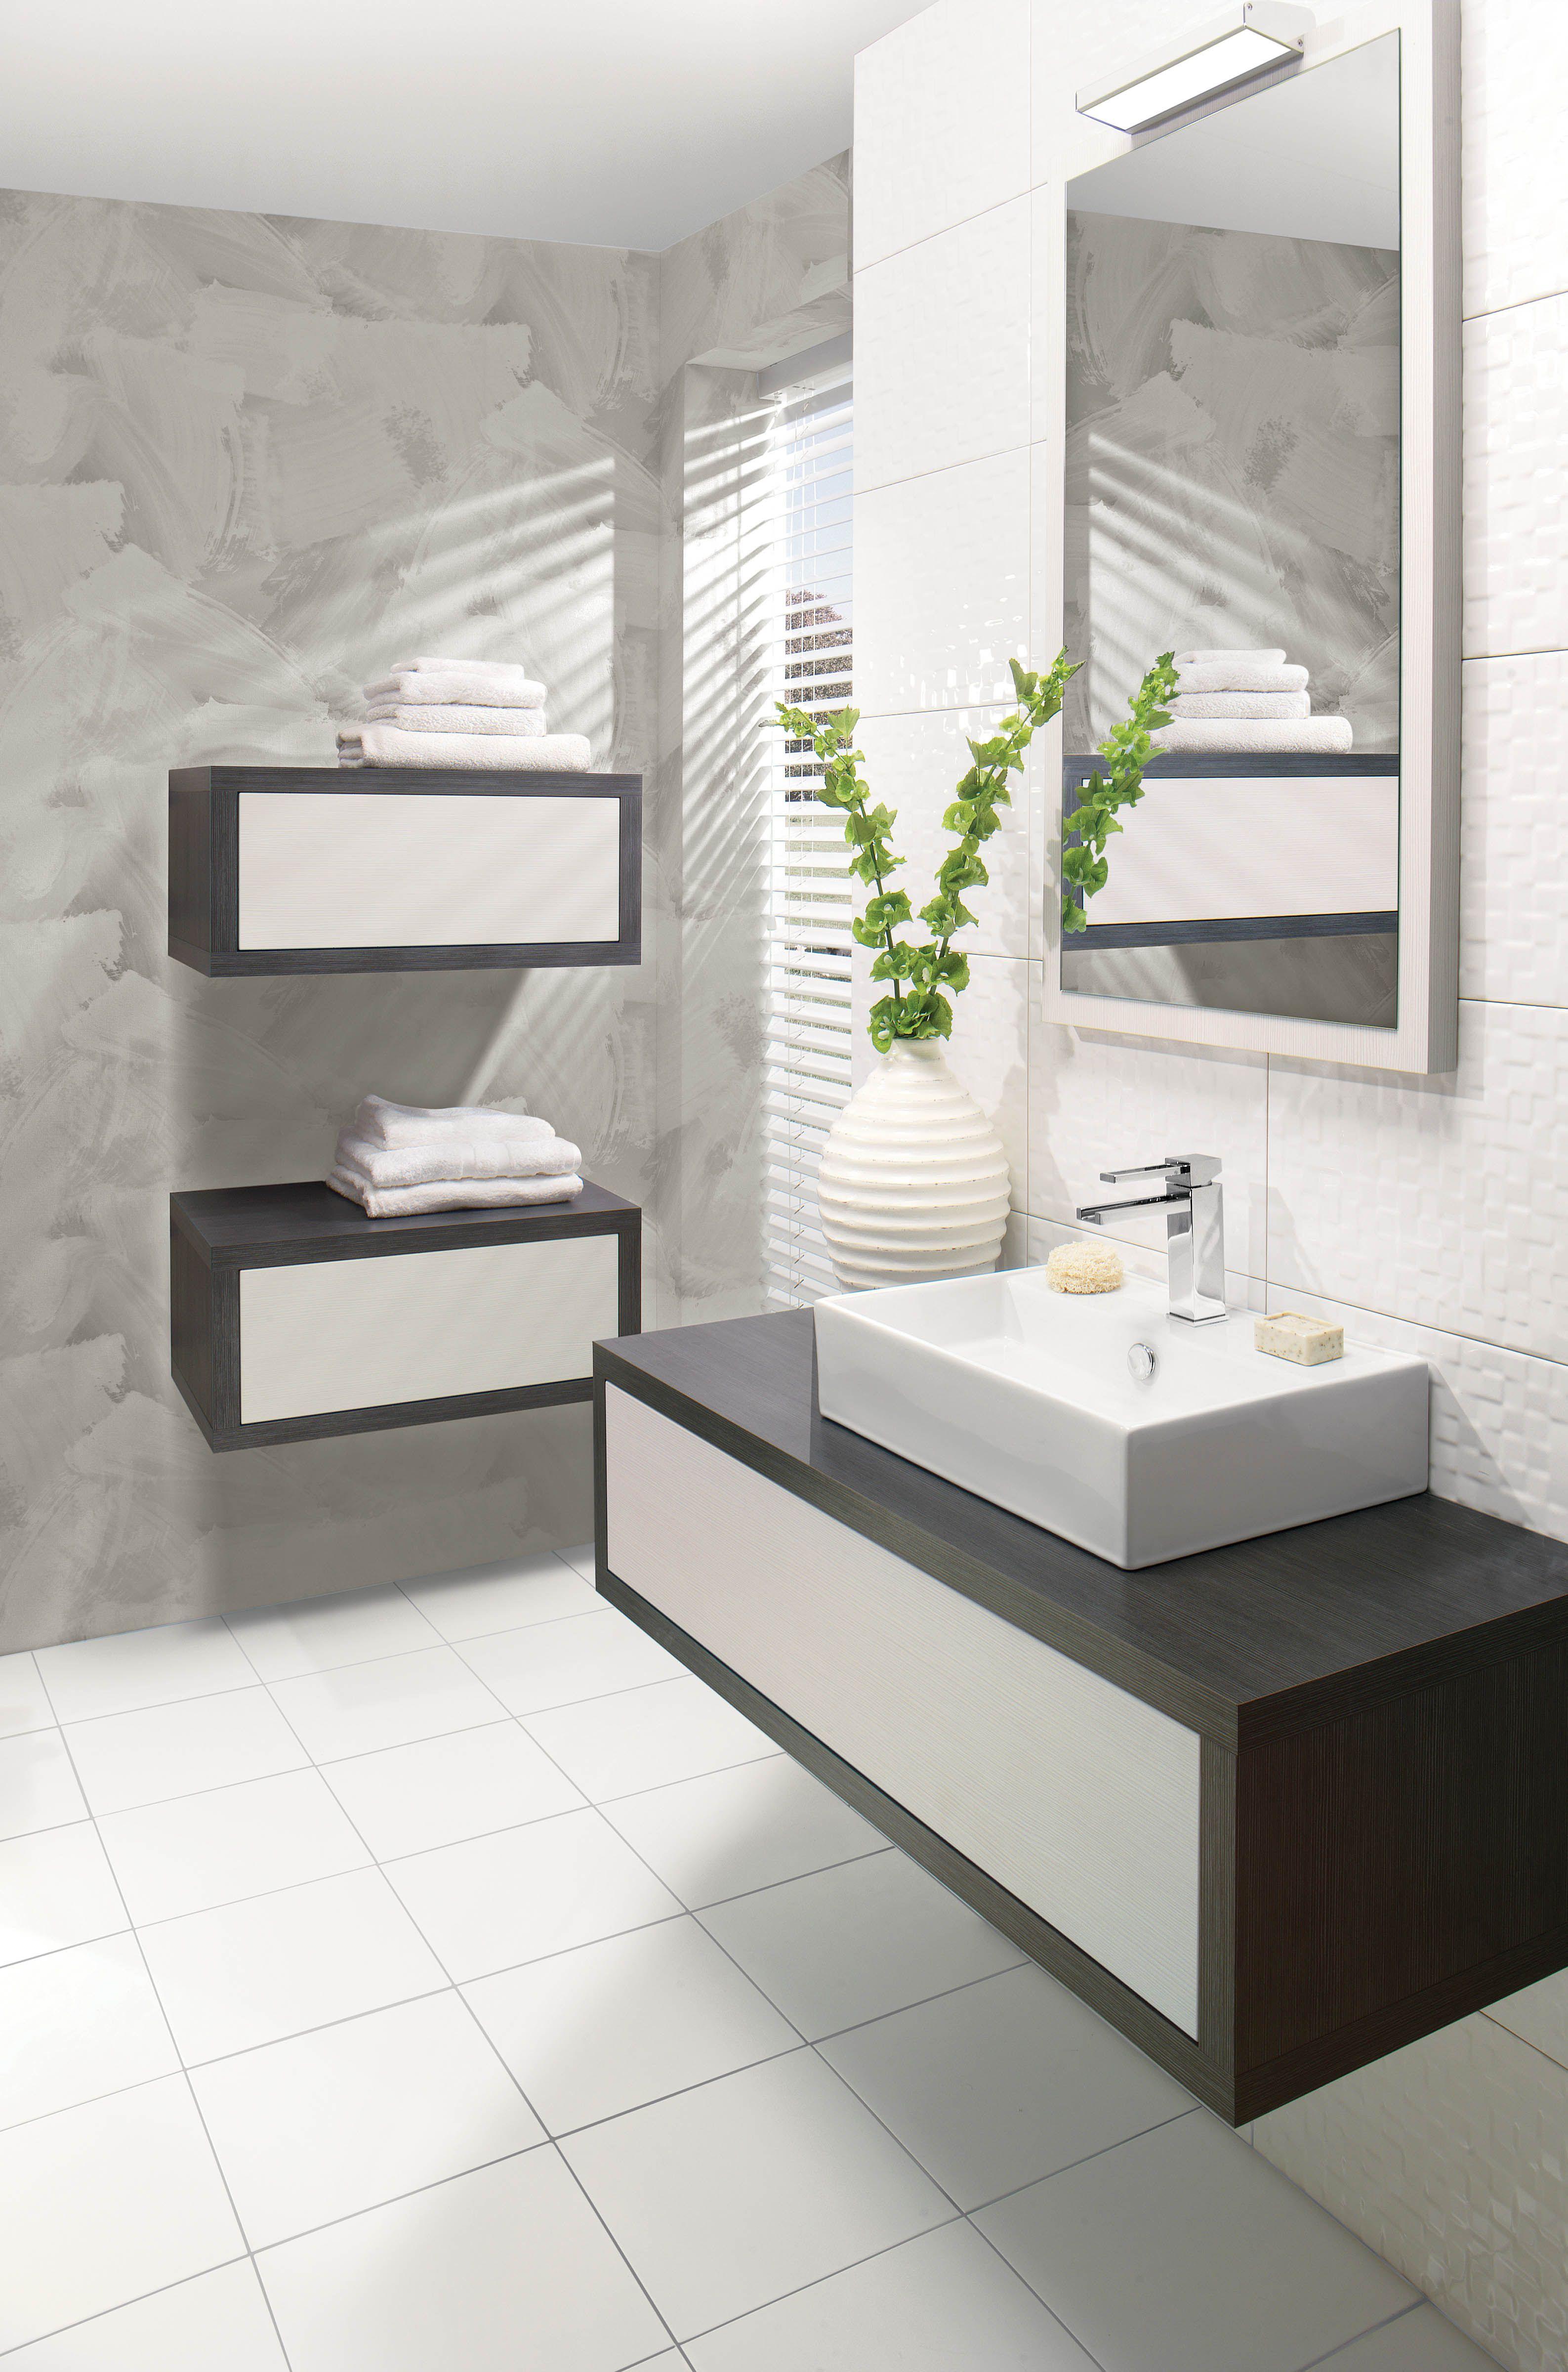 Touch Steel Bathroom Furniture Range from Crosswater http://www ...